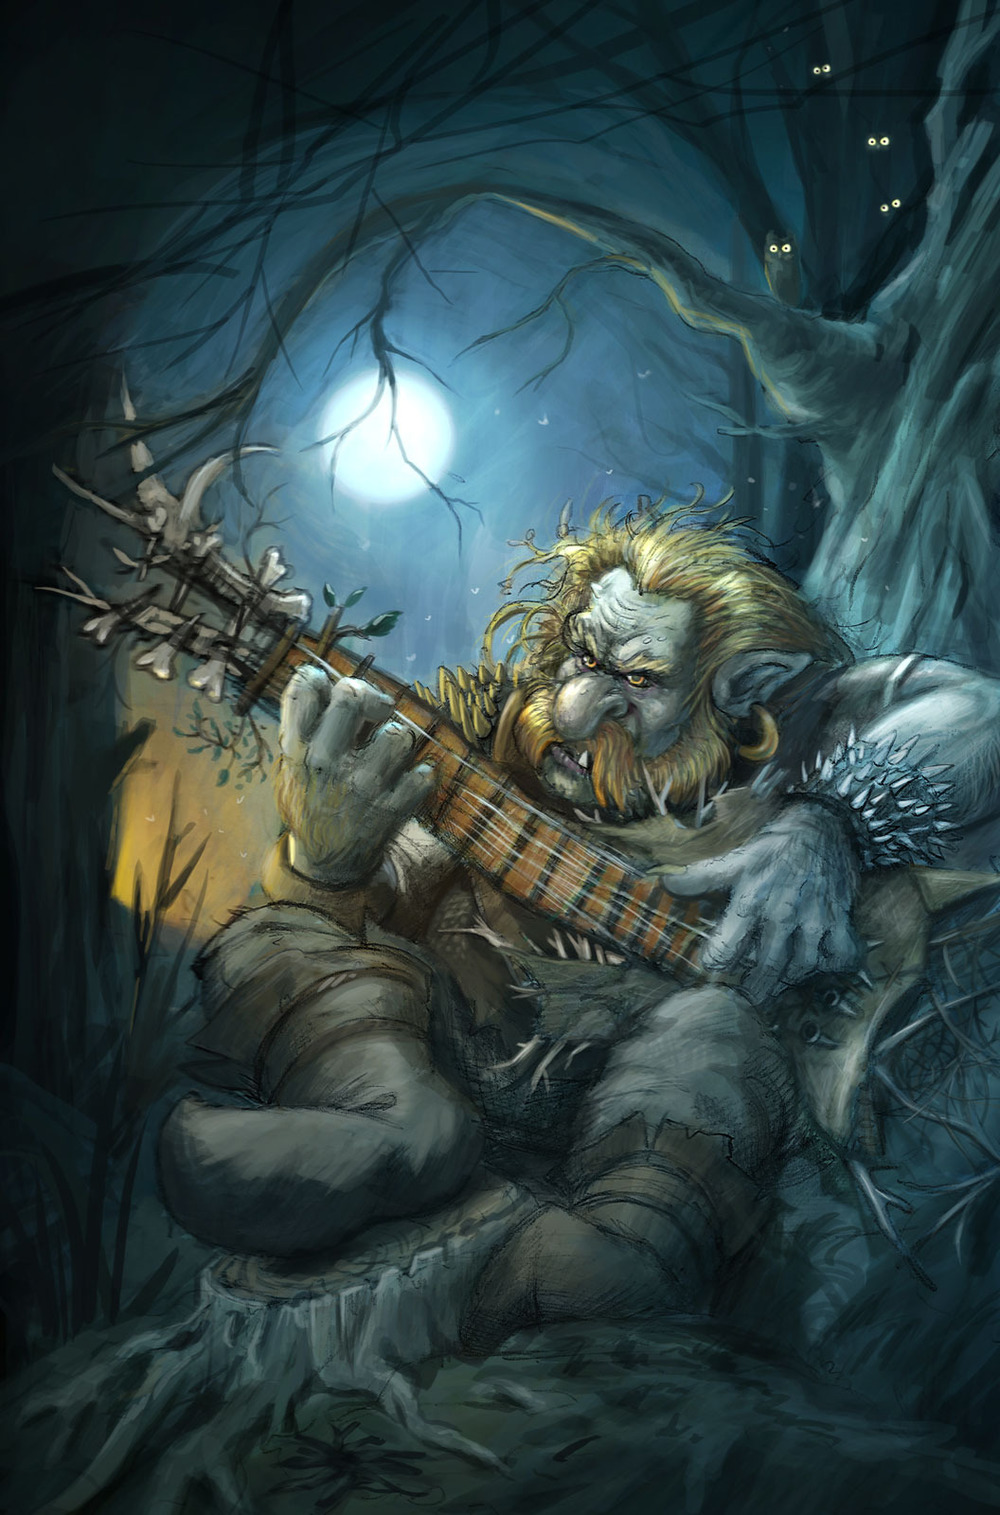 """Guitar Troll"" by Steve Bolduc"